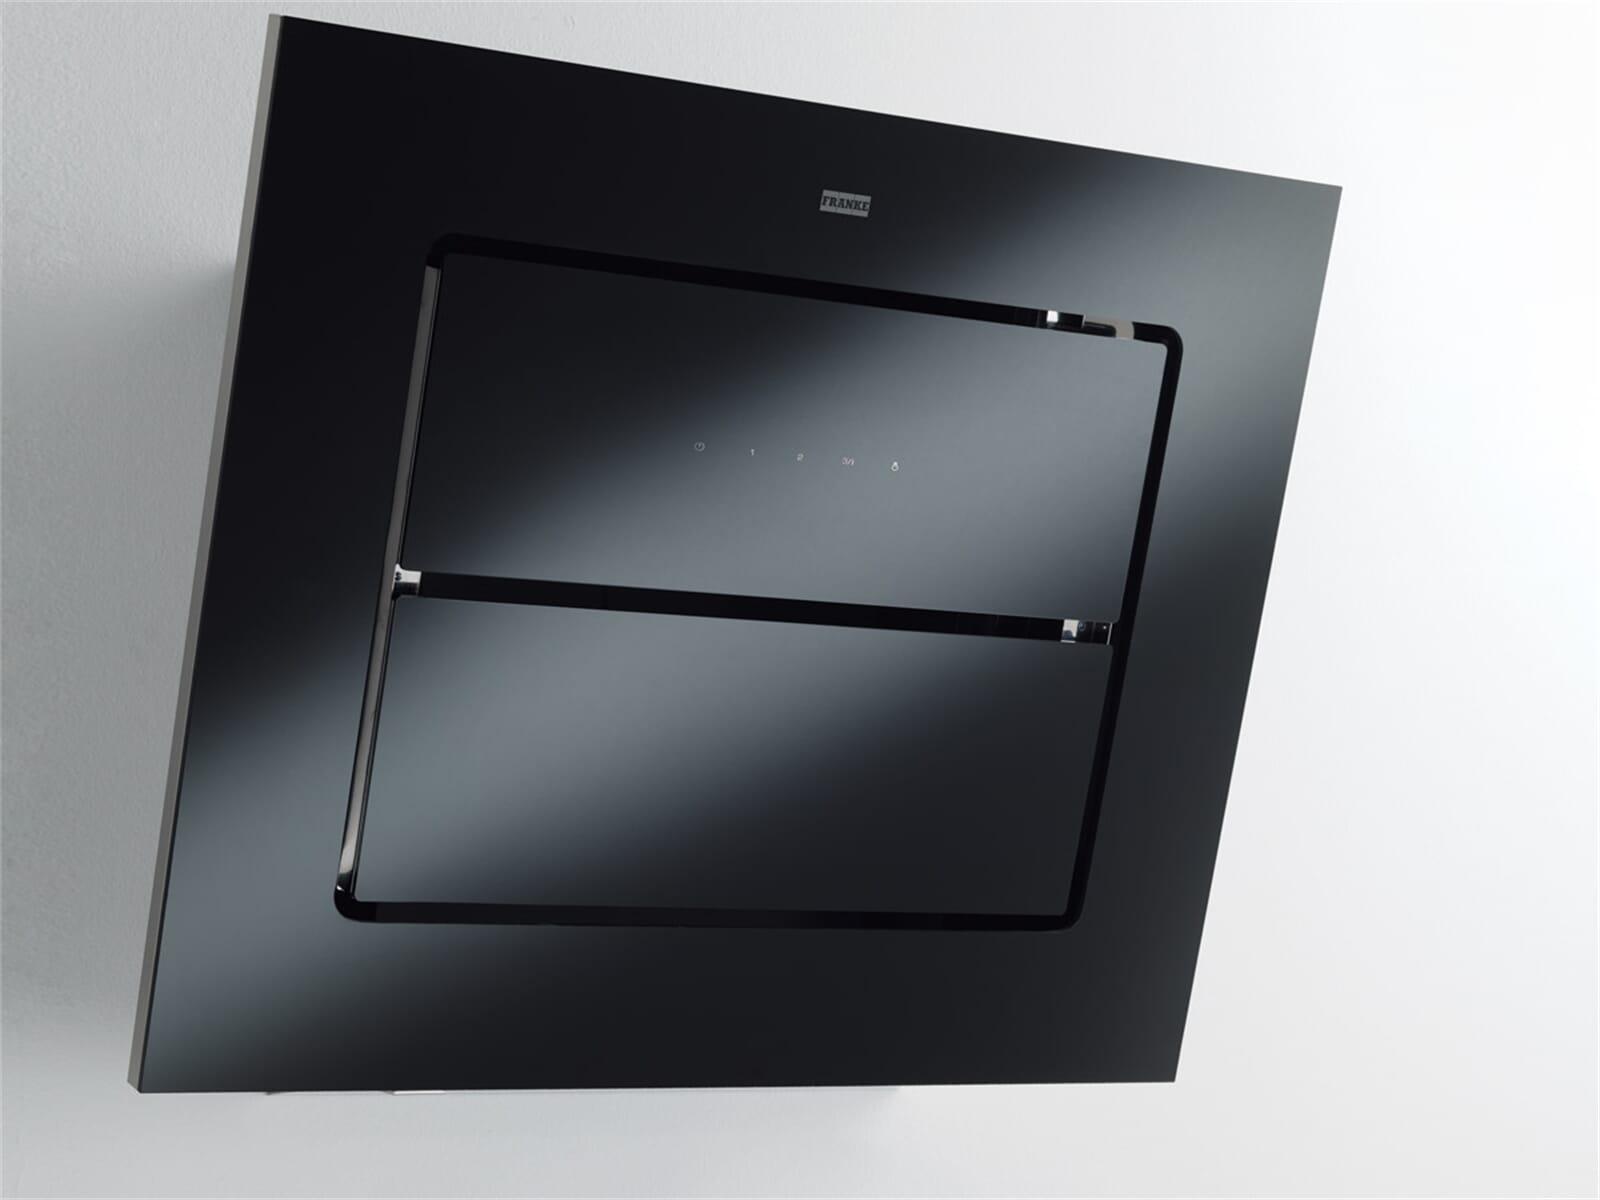 franke large screen fls 905 bk kopffrei wand dunstabzugshaube schwarz f r 807 90 eur shop. Black Bedroom Furniture Sets. Home Design Ideas